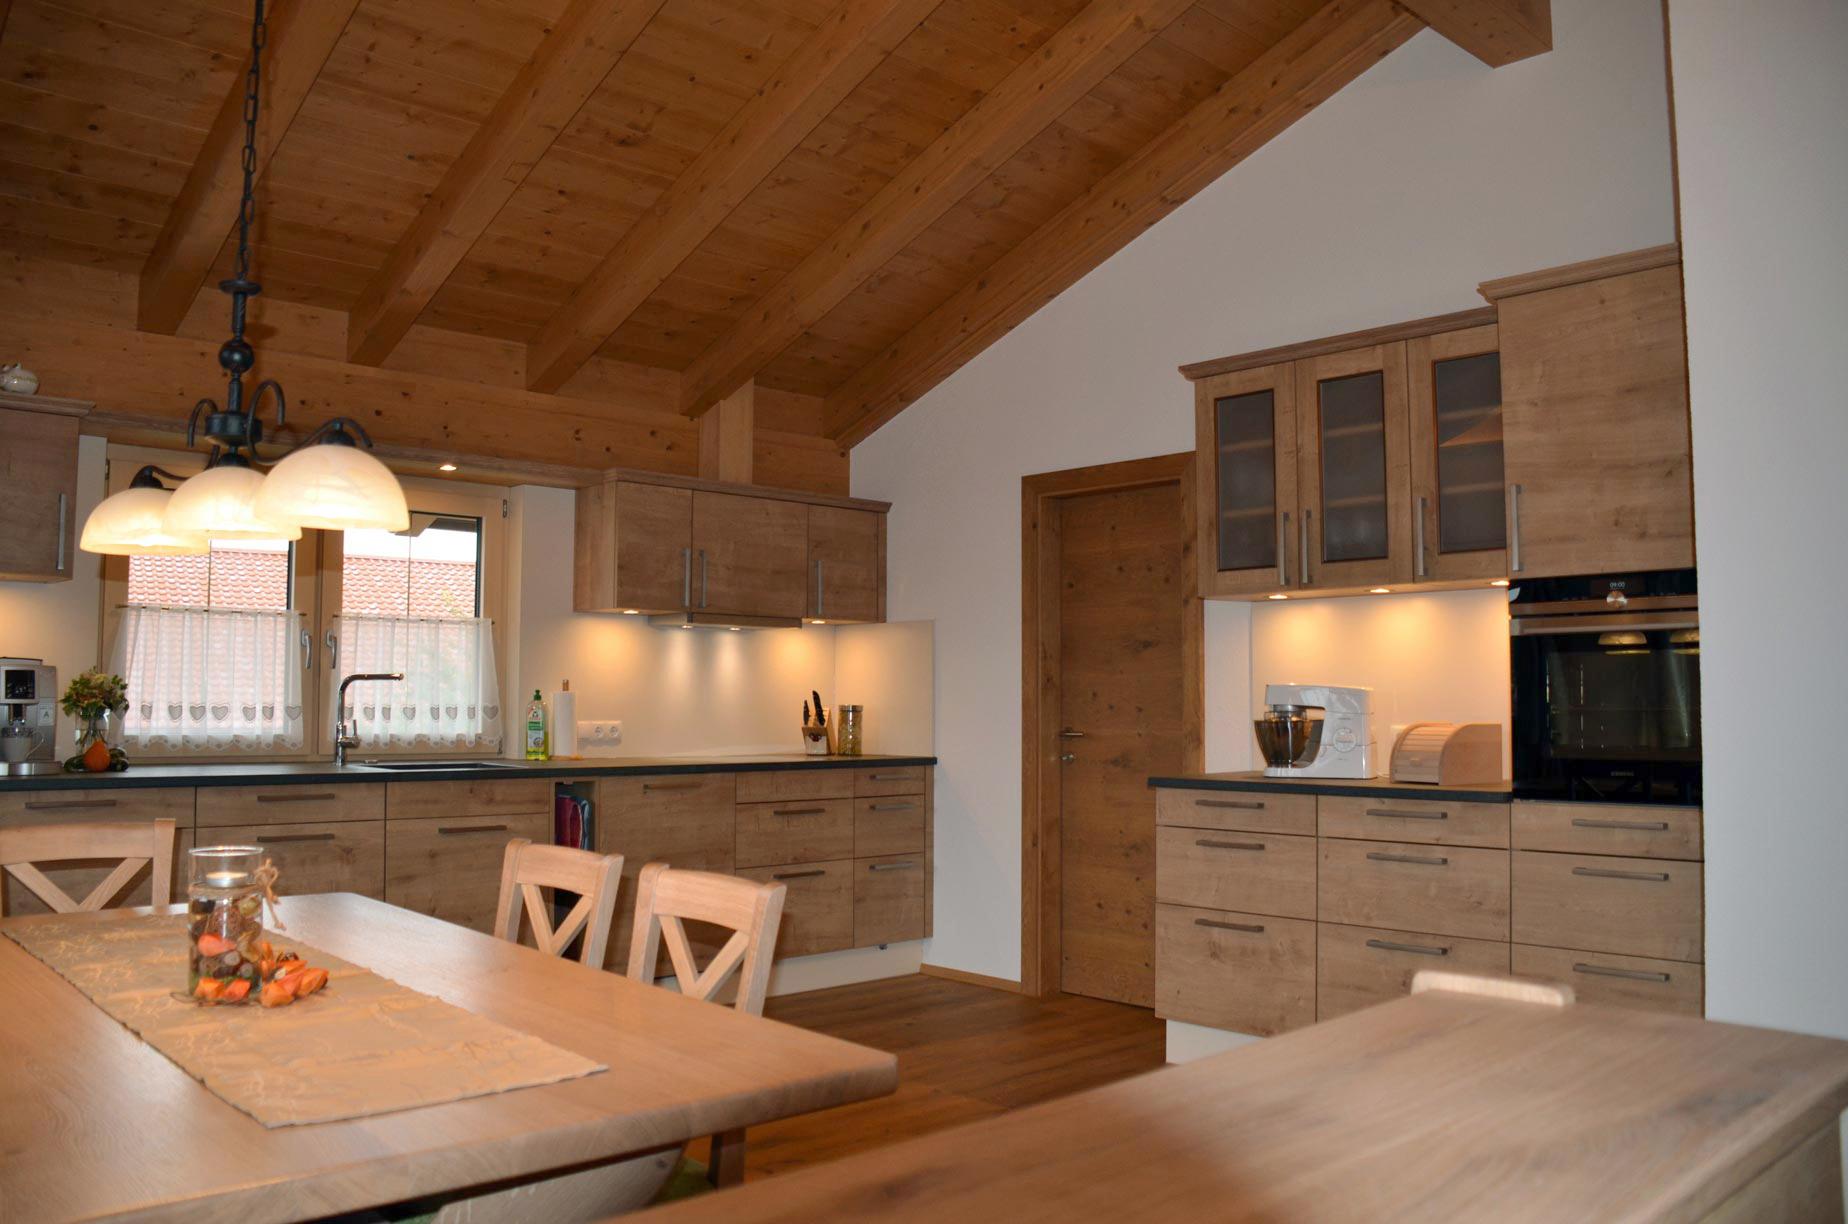 Erfreut Bauernküche Stühle Uk Ideen - Küche Set Ideen ...